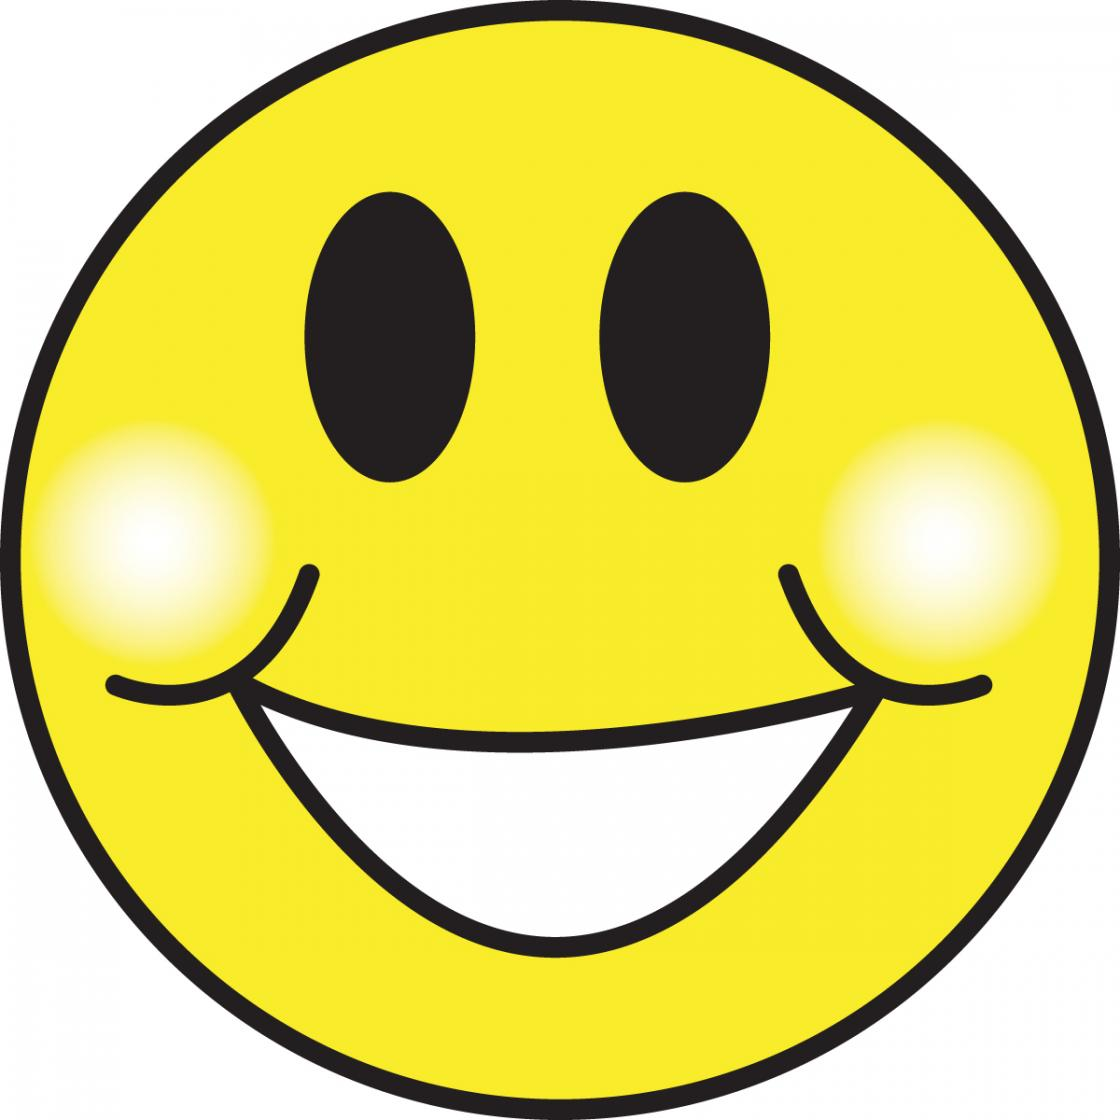 Big Smiley Face Clip Art N6 free image.